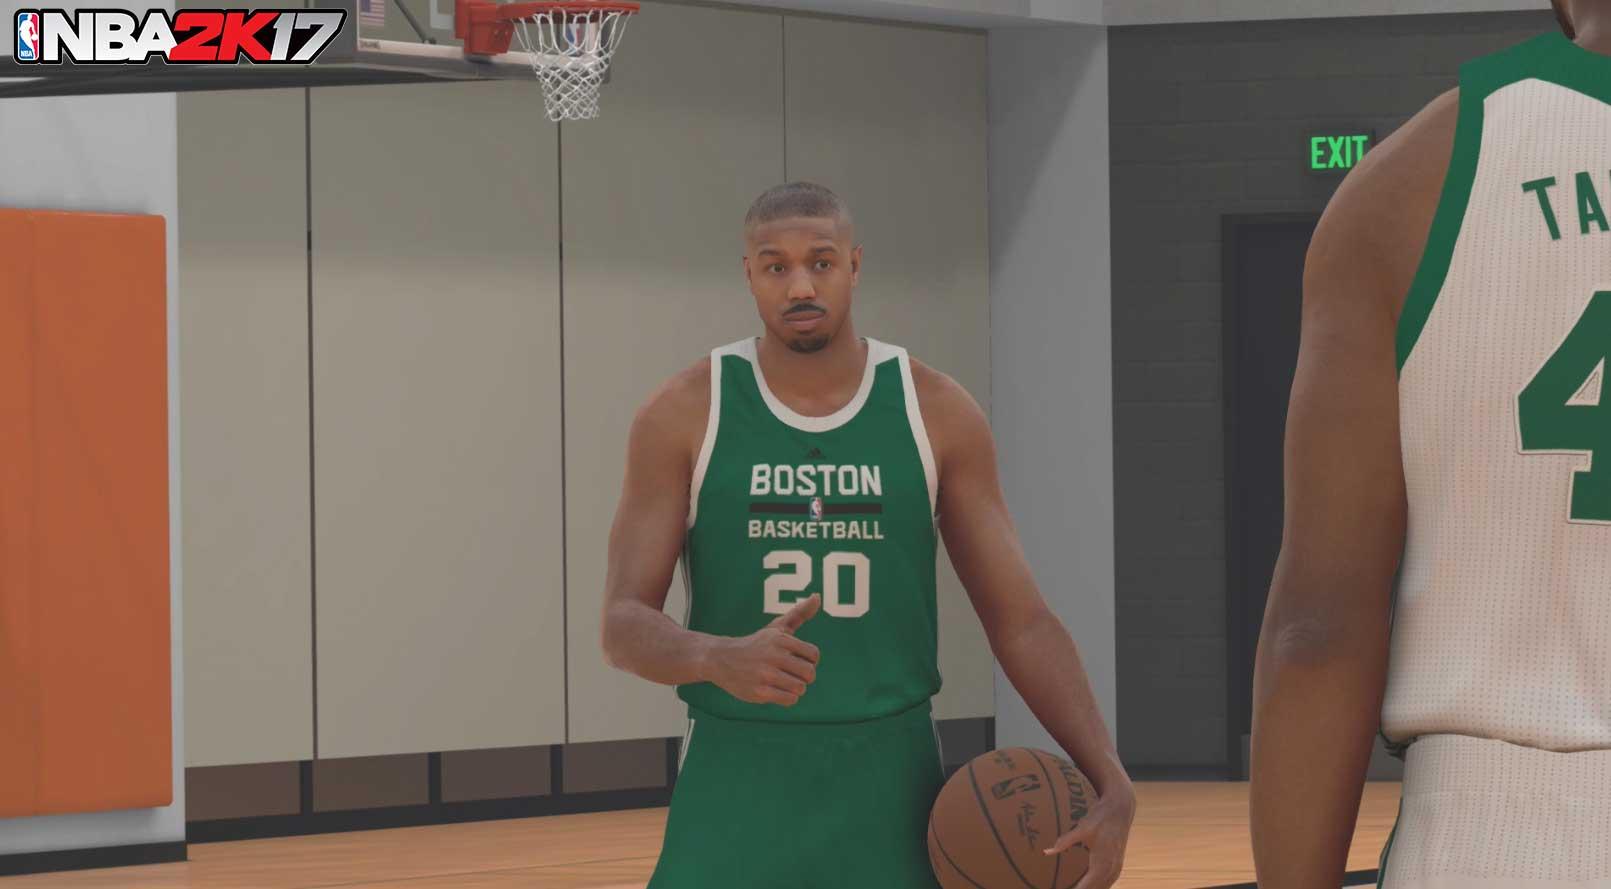 MichaelB_NBA2K17_2